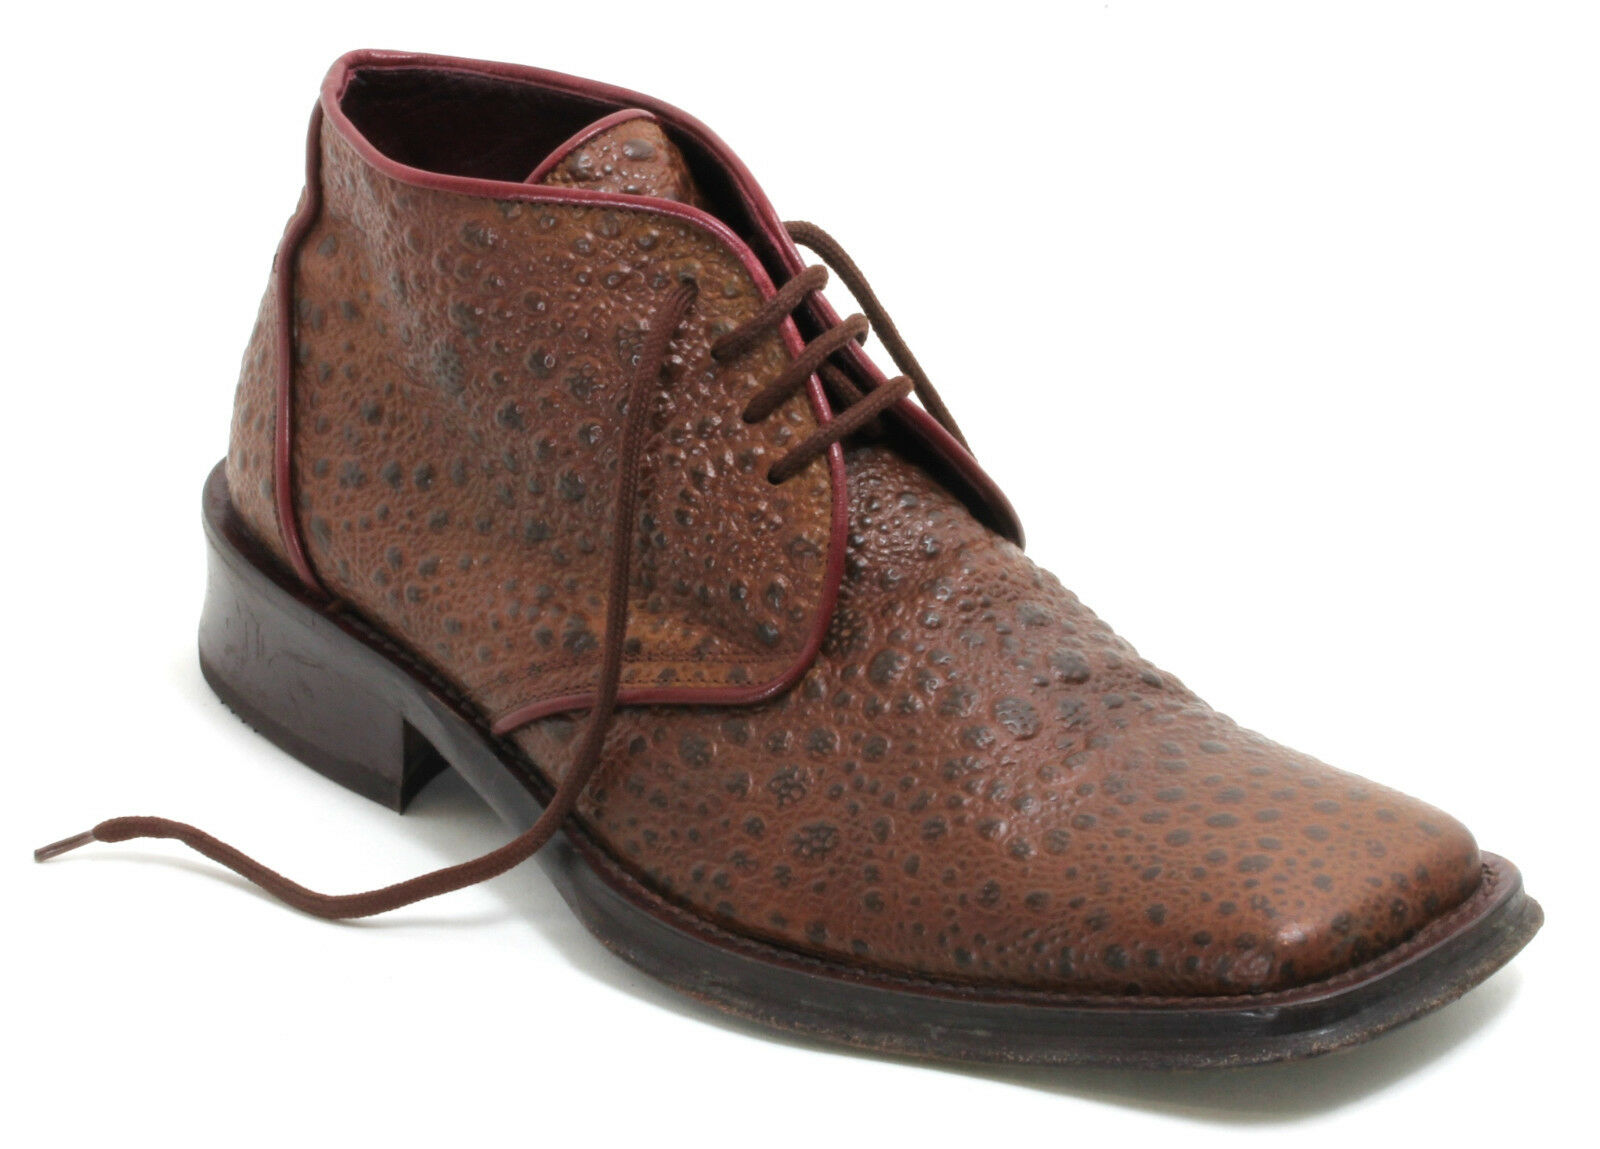 Western botas botas de vaquero solchaga style line Dance semi zapato schnürschuh 42,5